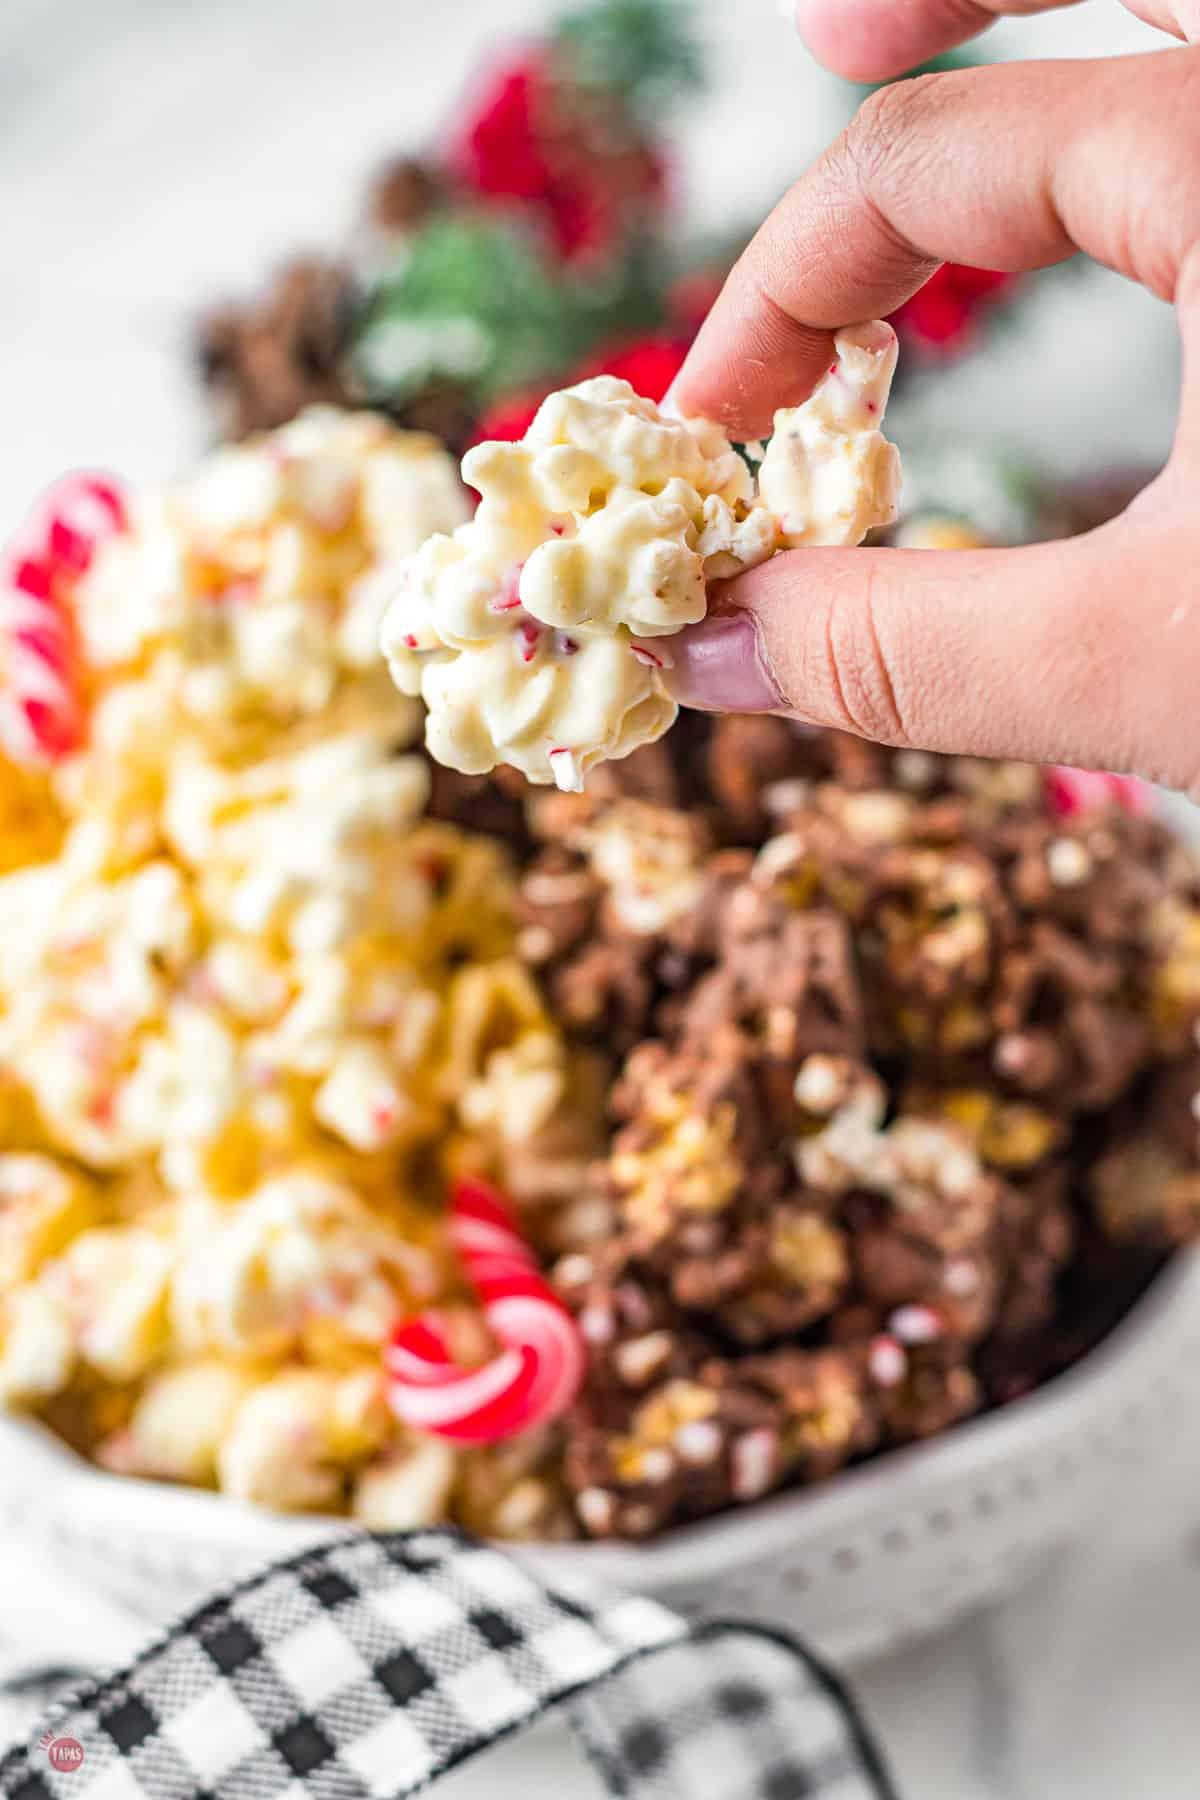 hand holding piece of popcorn